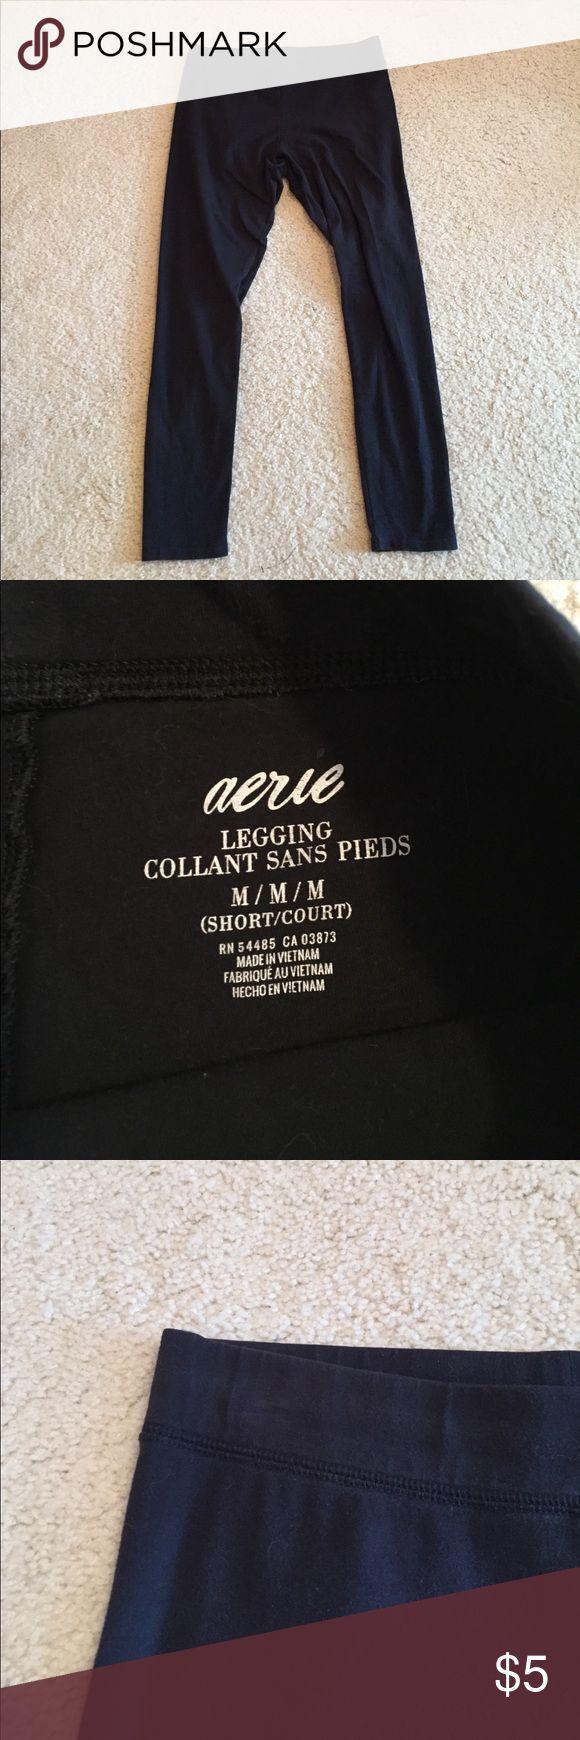 Aerie leggings medium short The most basic leggings you'll find. Size medium short. Black and not faded at all aerie Pants Leggings